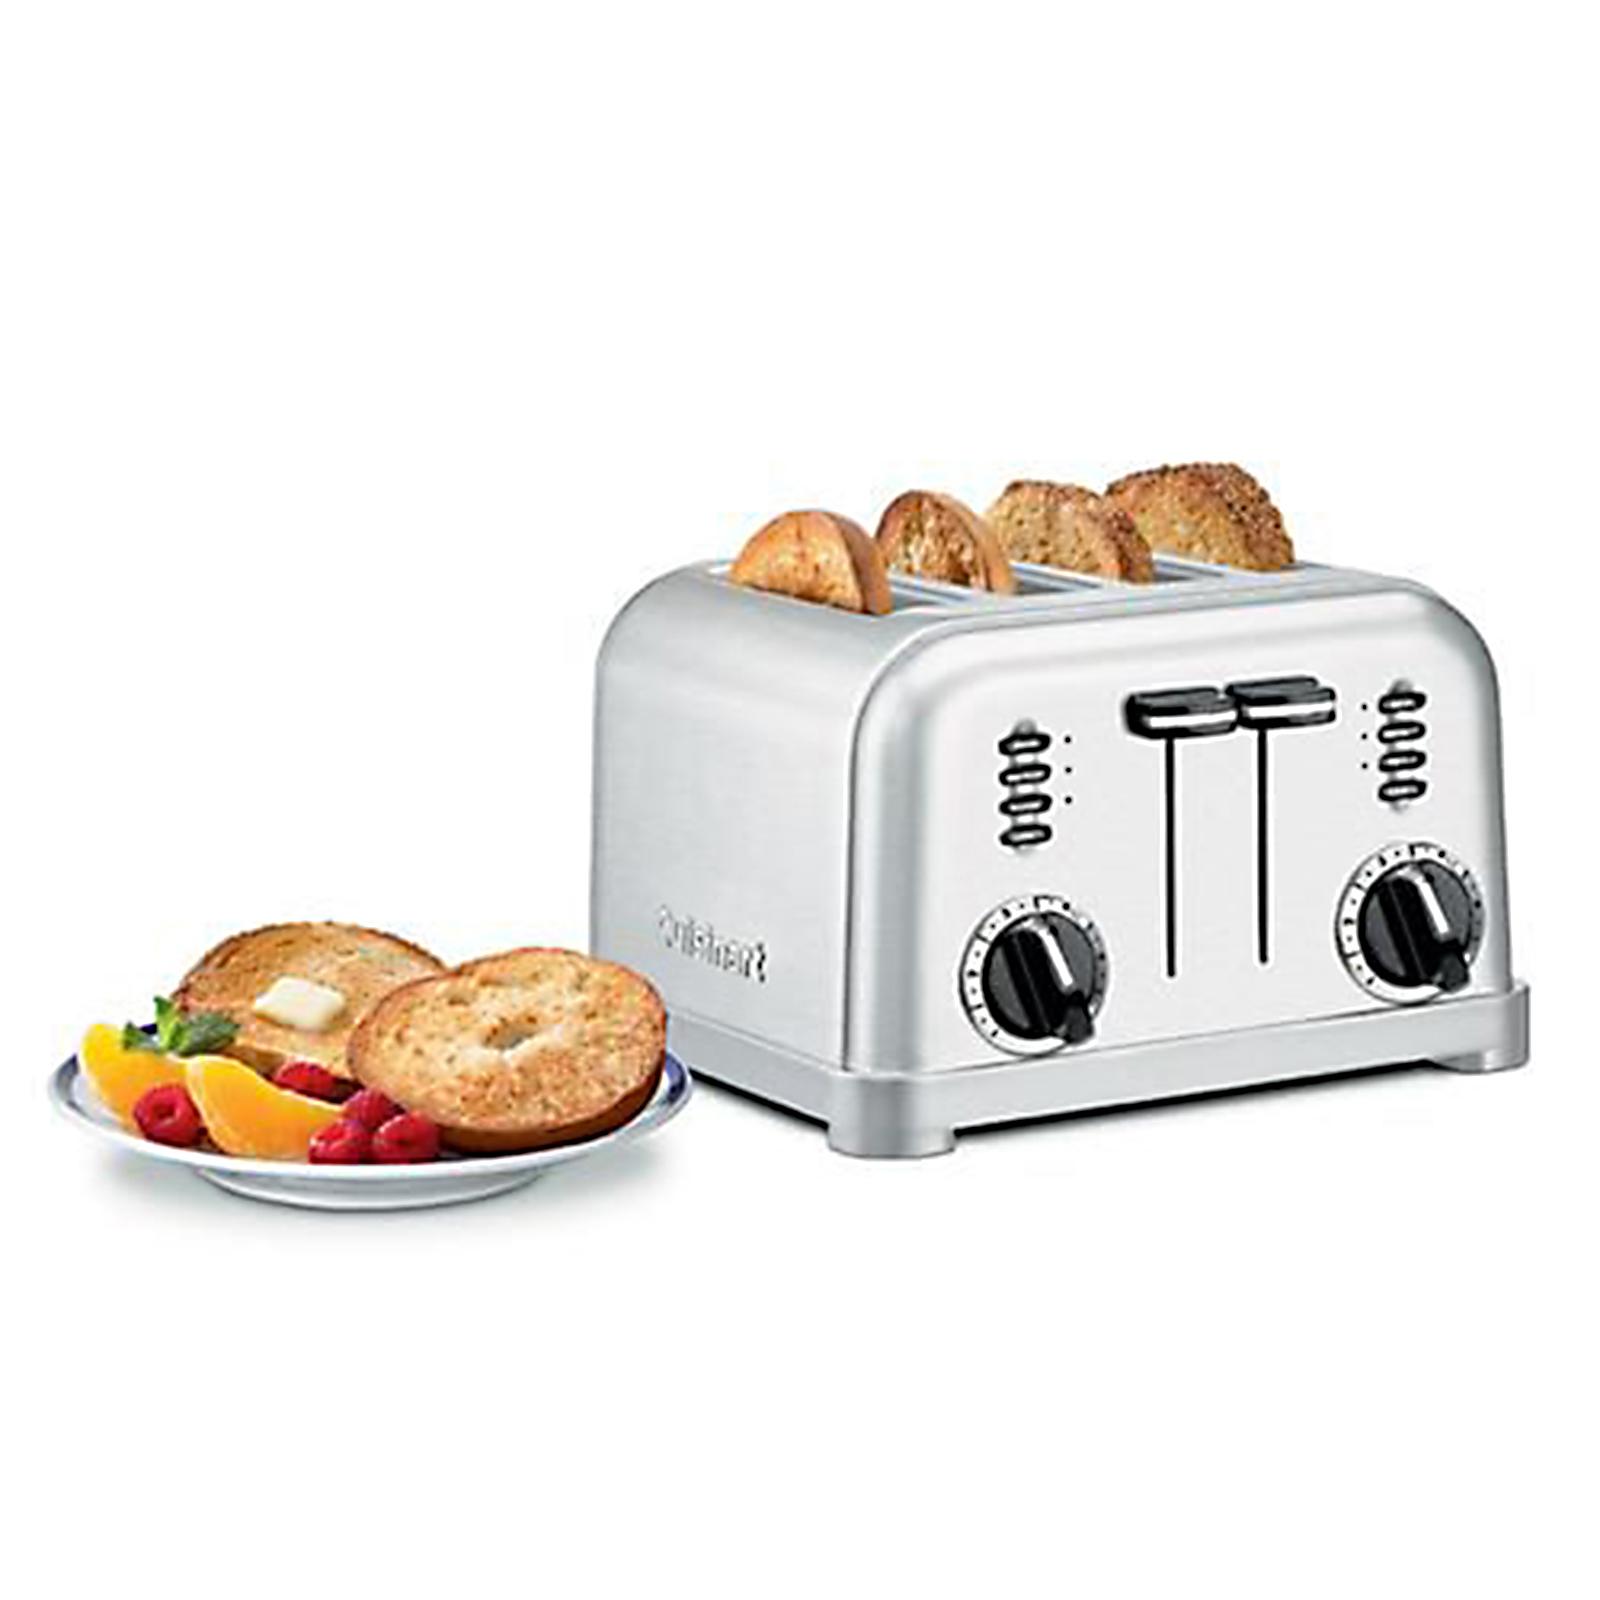 Cuisinart 2-Slice Toaster - Stainless Steel